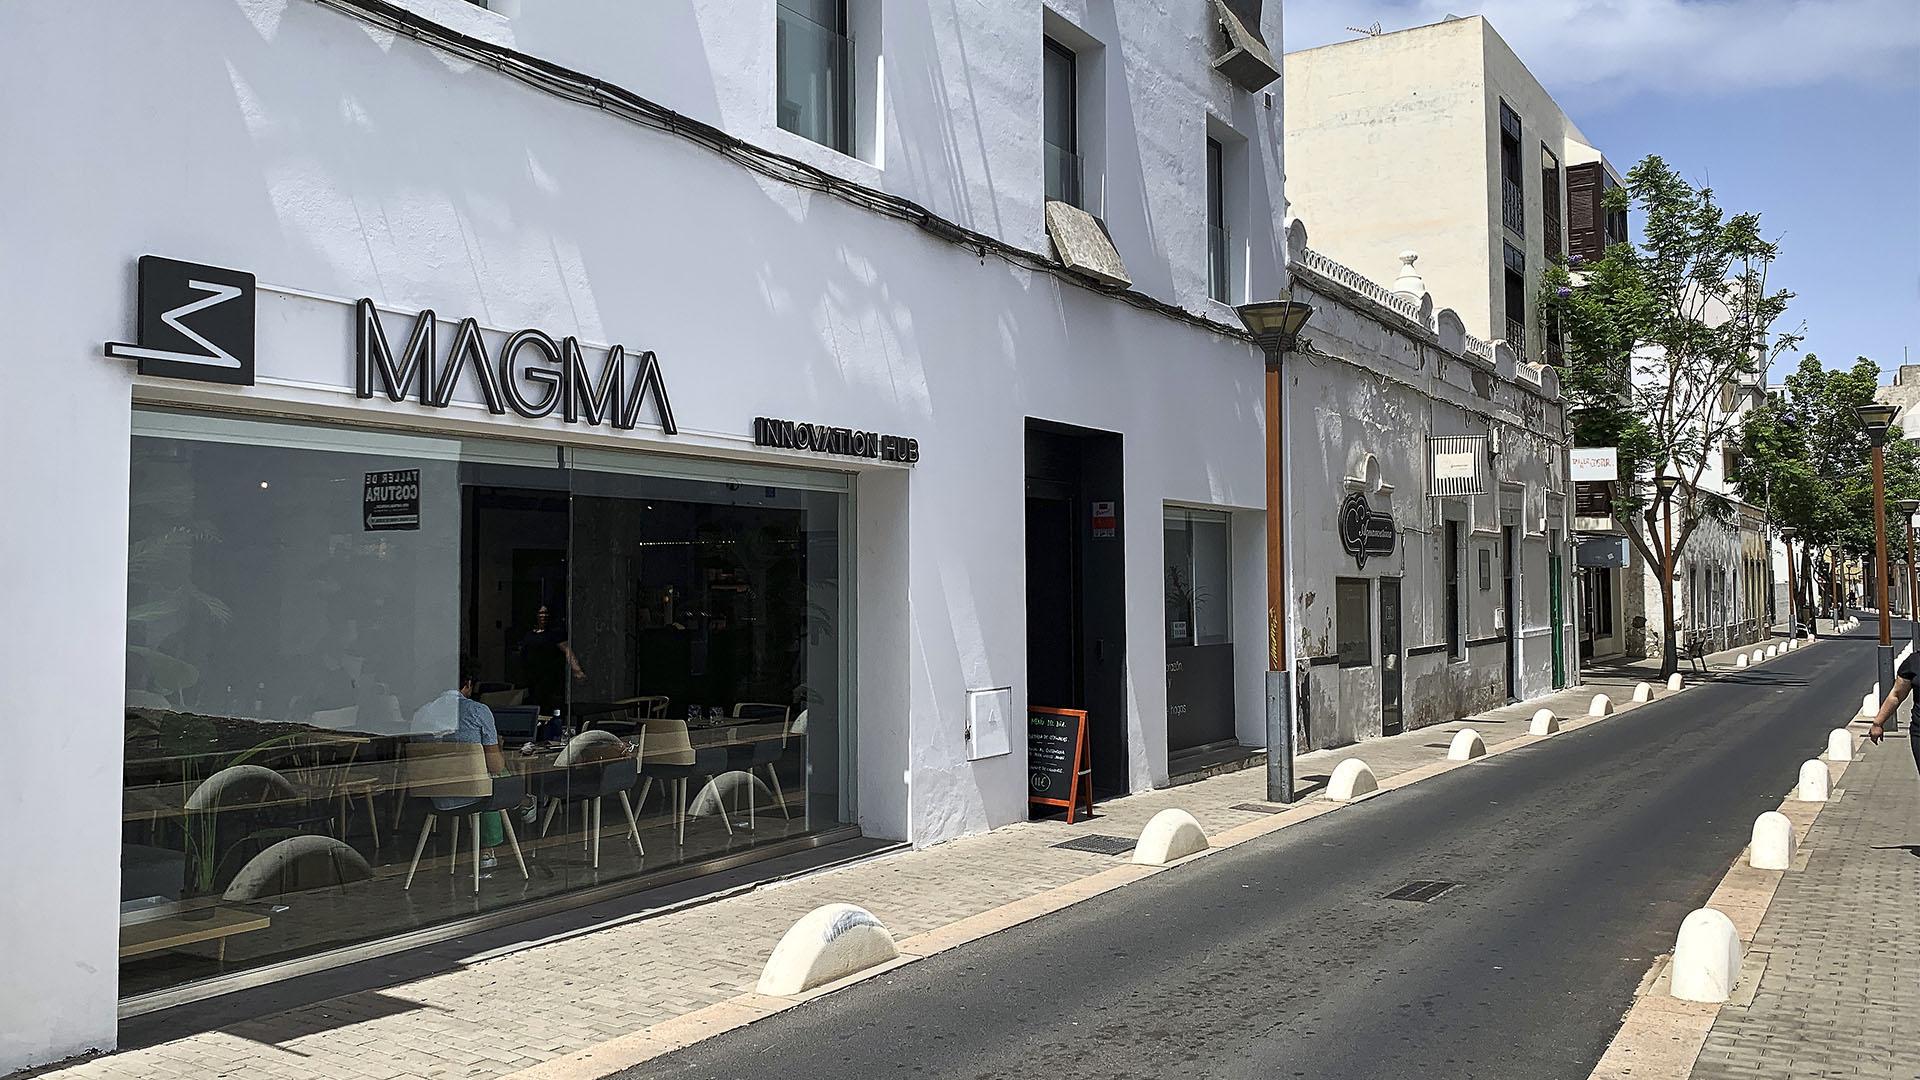 Magma Innovation Hub Arrecife Lanzarote.